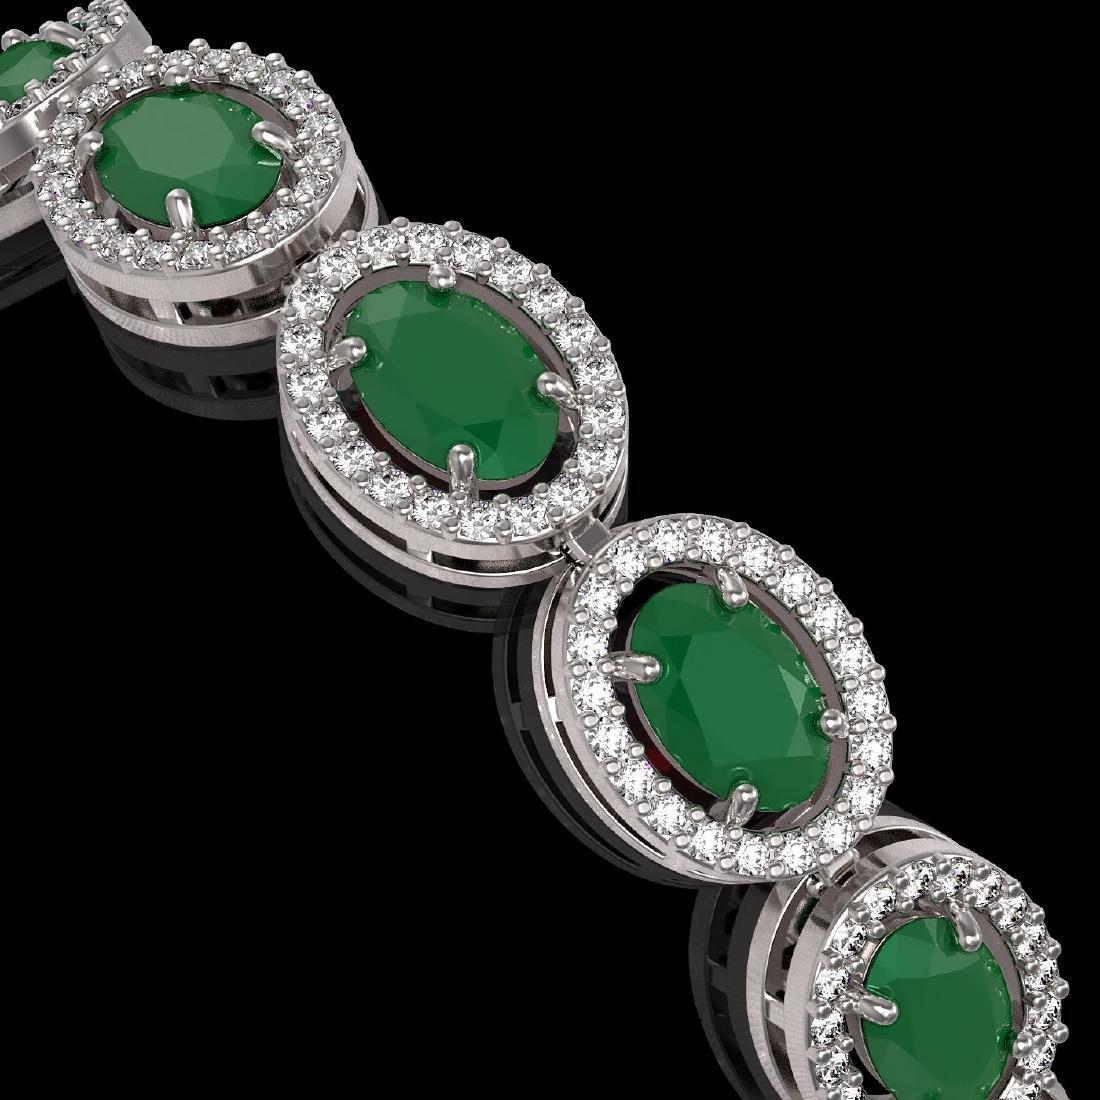 15.2 CTW Emerald & Diamond Halo Bracelet 10K White Gold